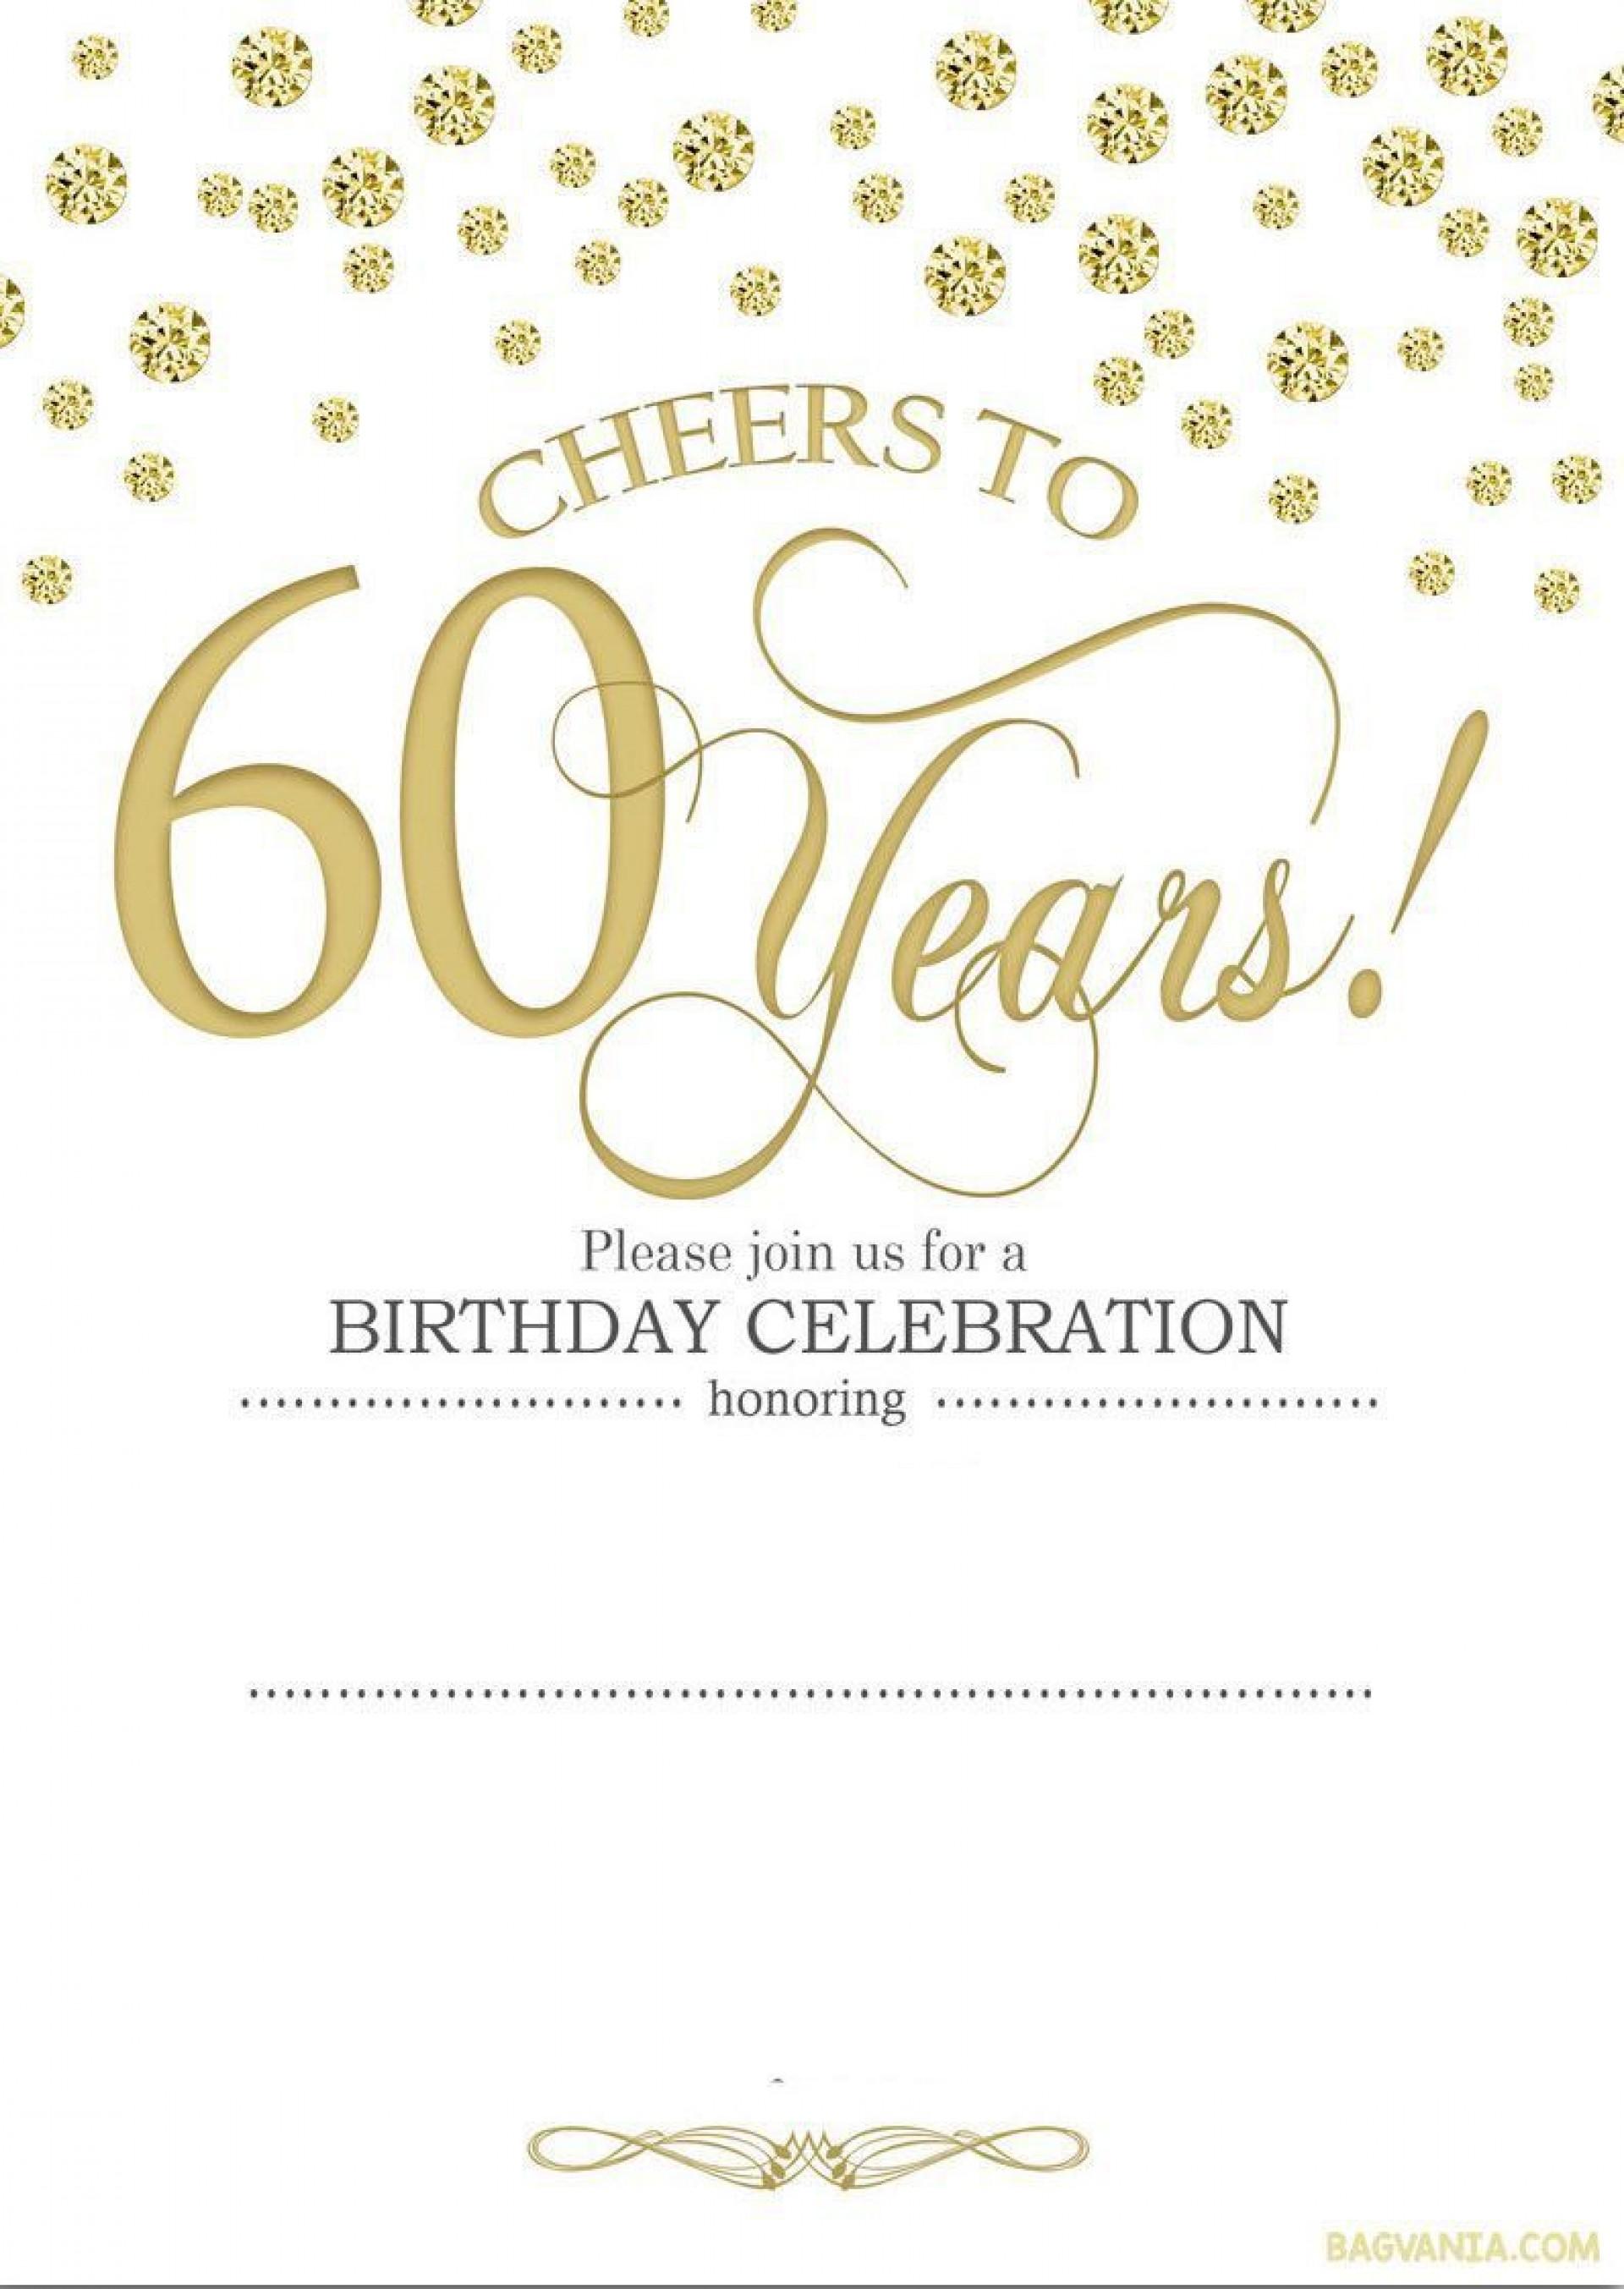 001 Stunning 60 Birthday Invite Template High Resolution  Templates 60th Printable Free1920